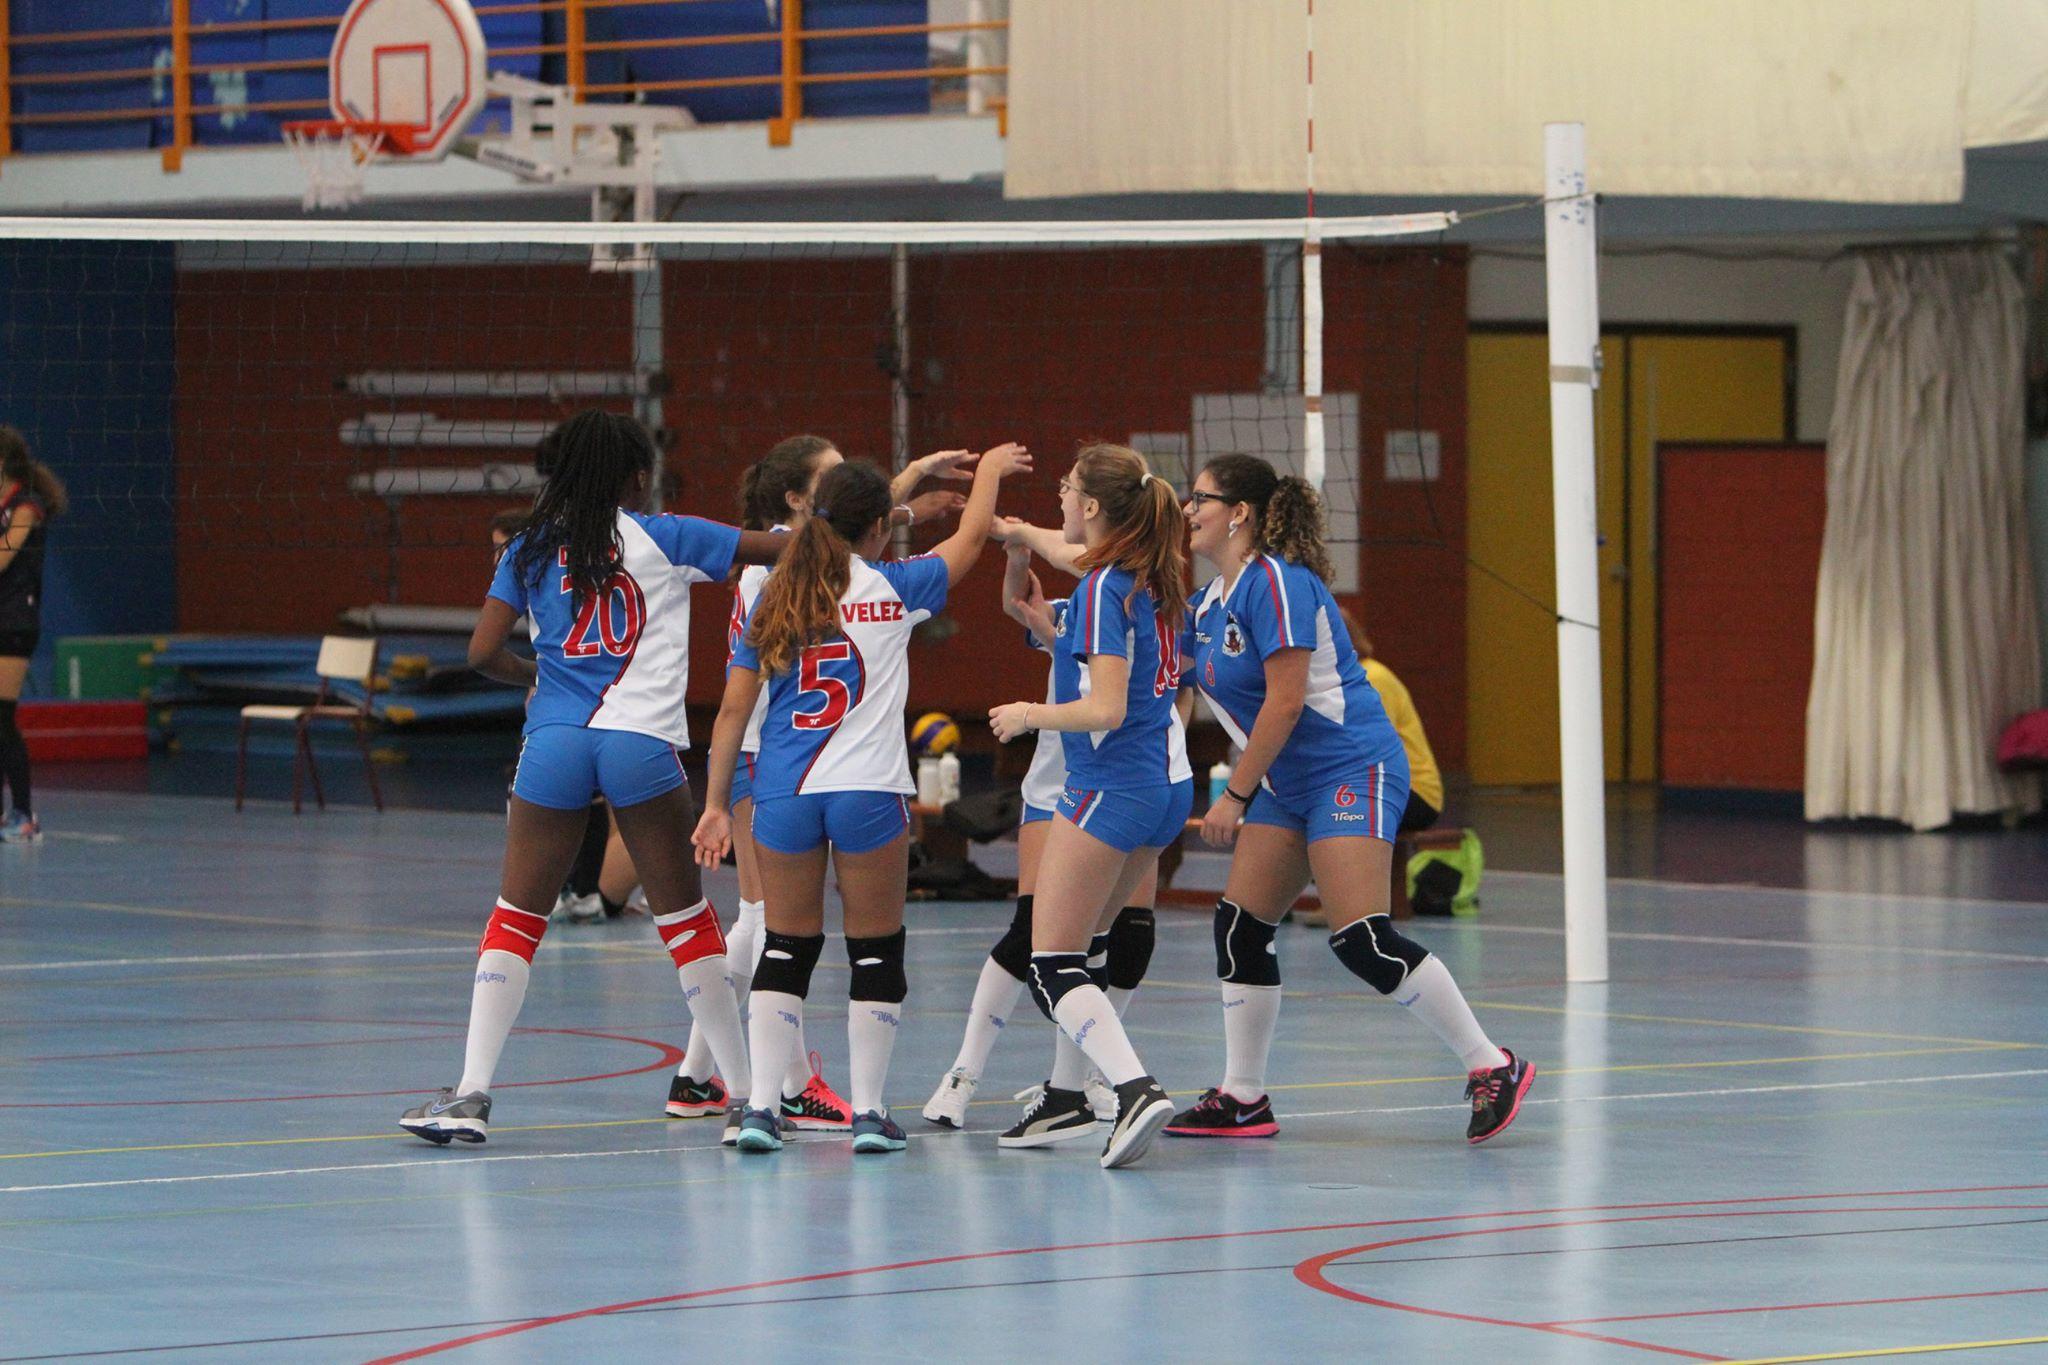 FCA_Juvenis_2015_16_fot_Jorge_Teixeira_02_.jpg